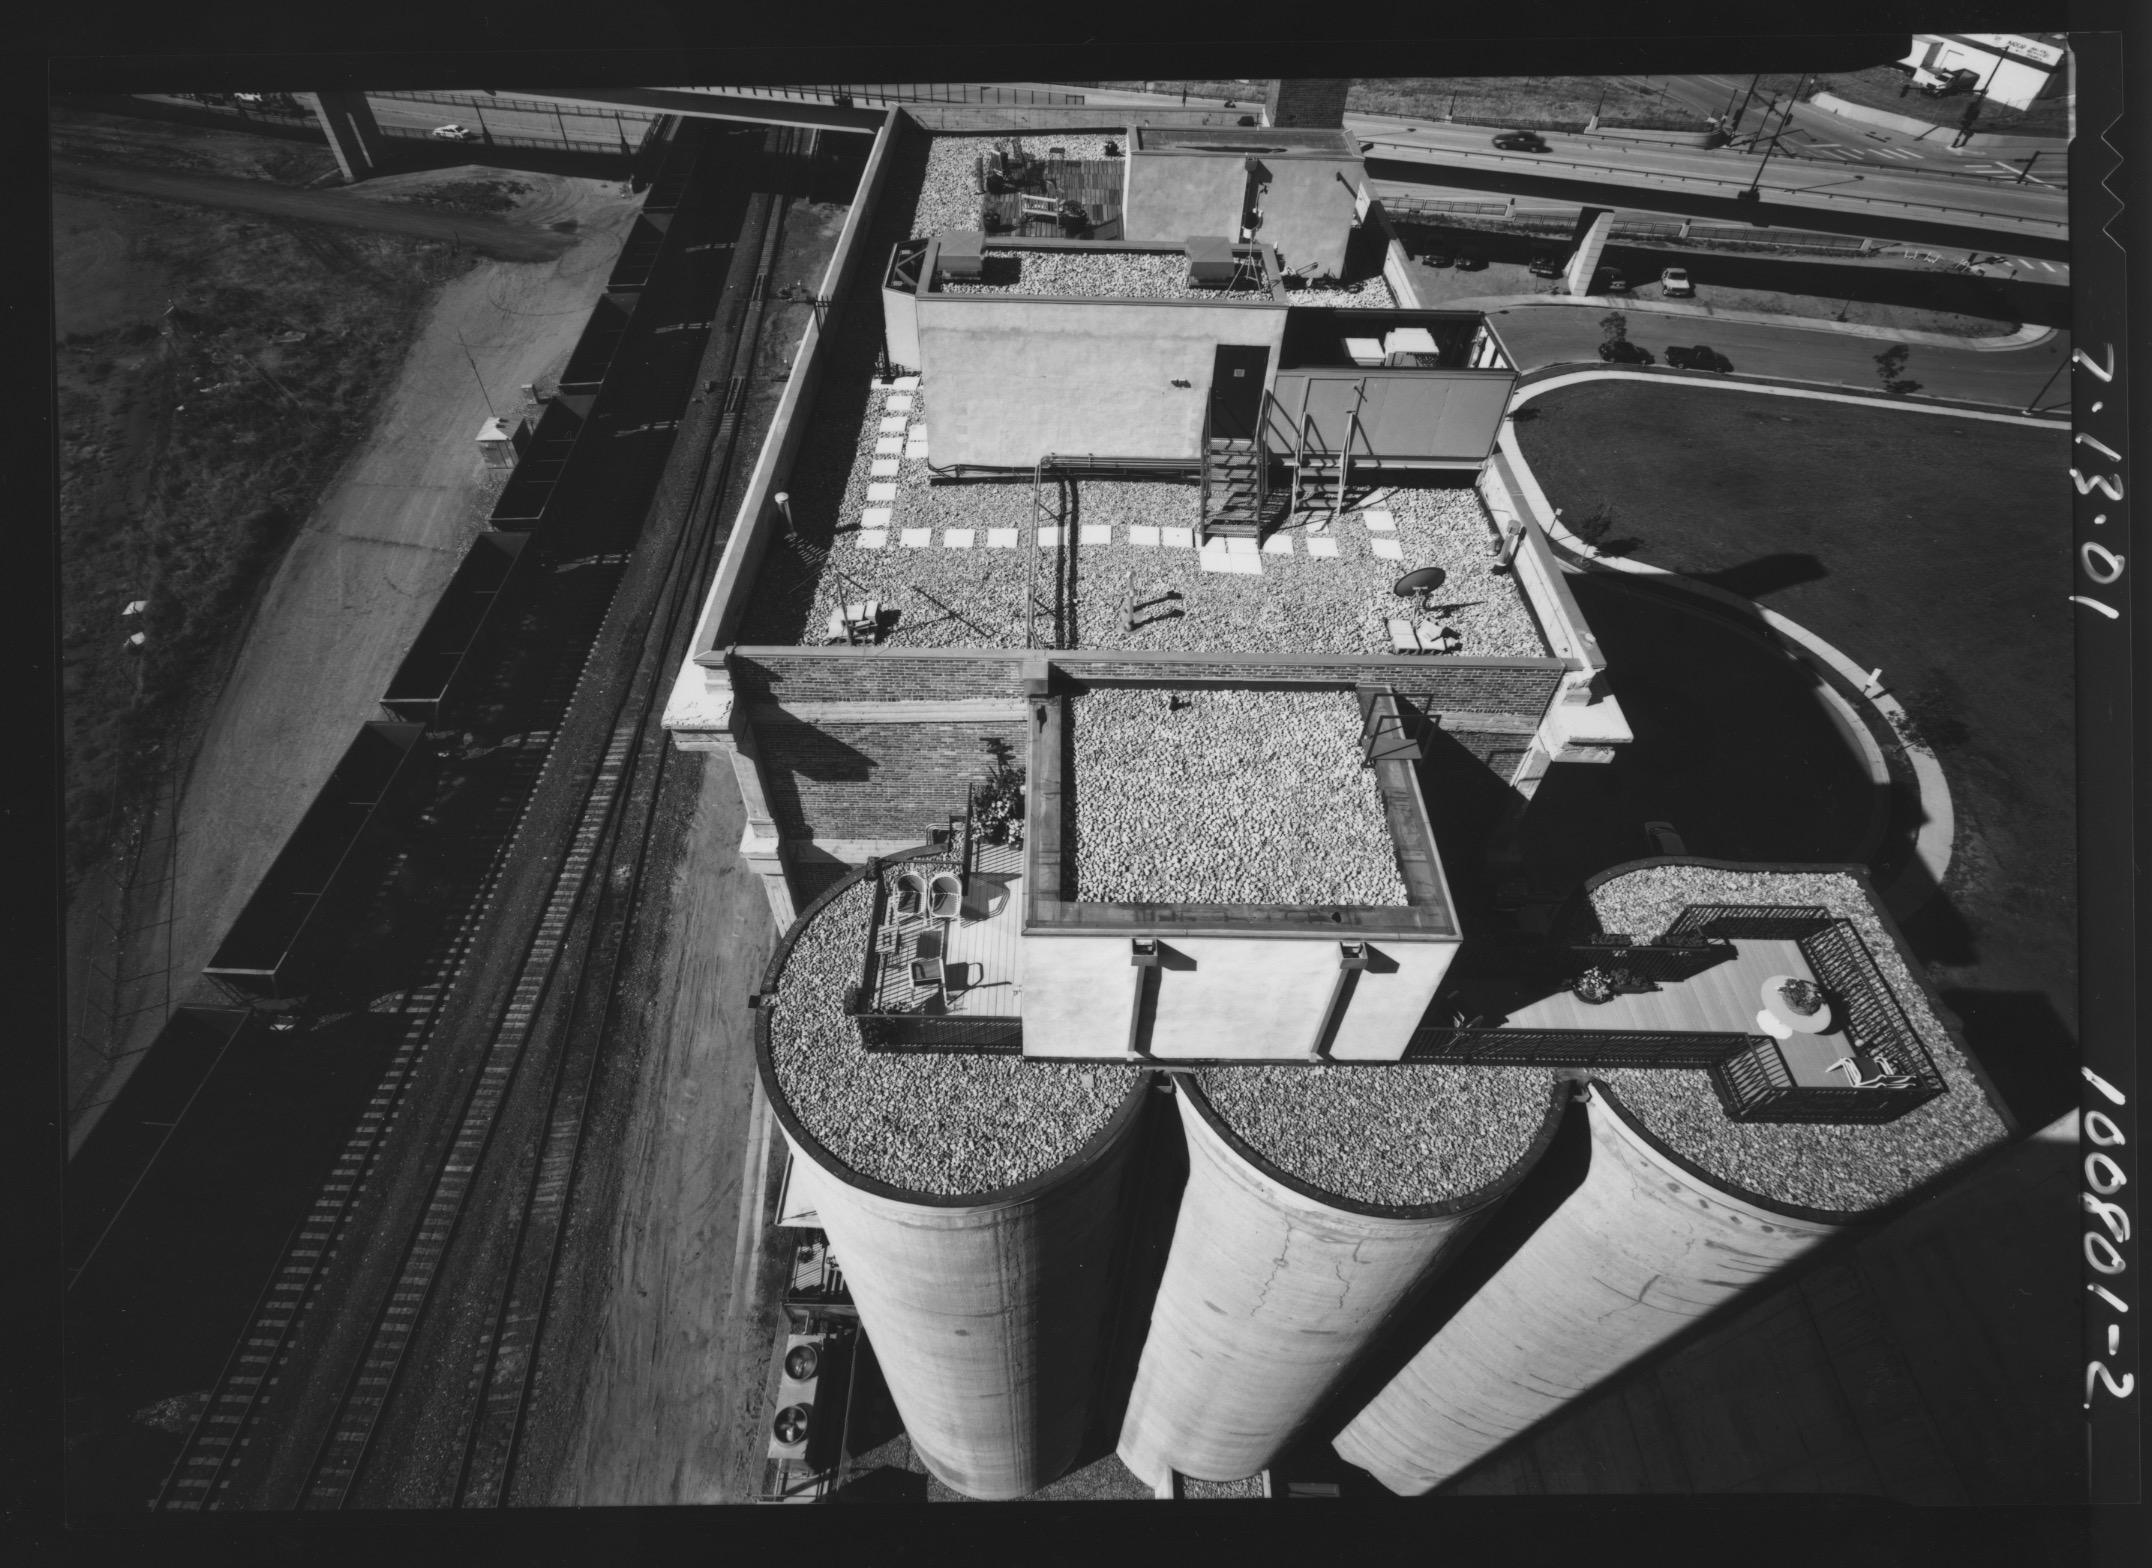 Grain Towers Platte River Valley October 12. 2001